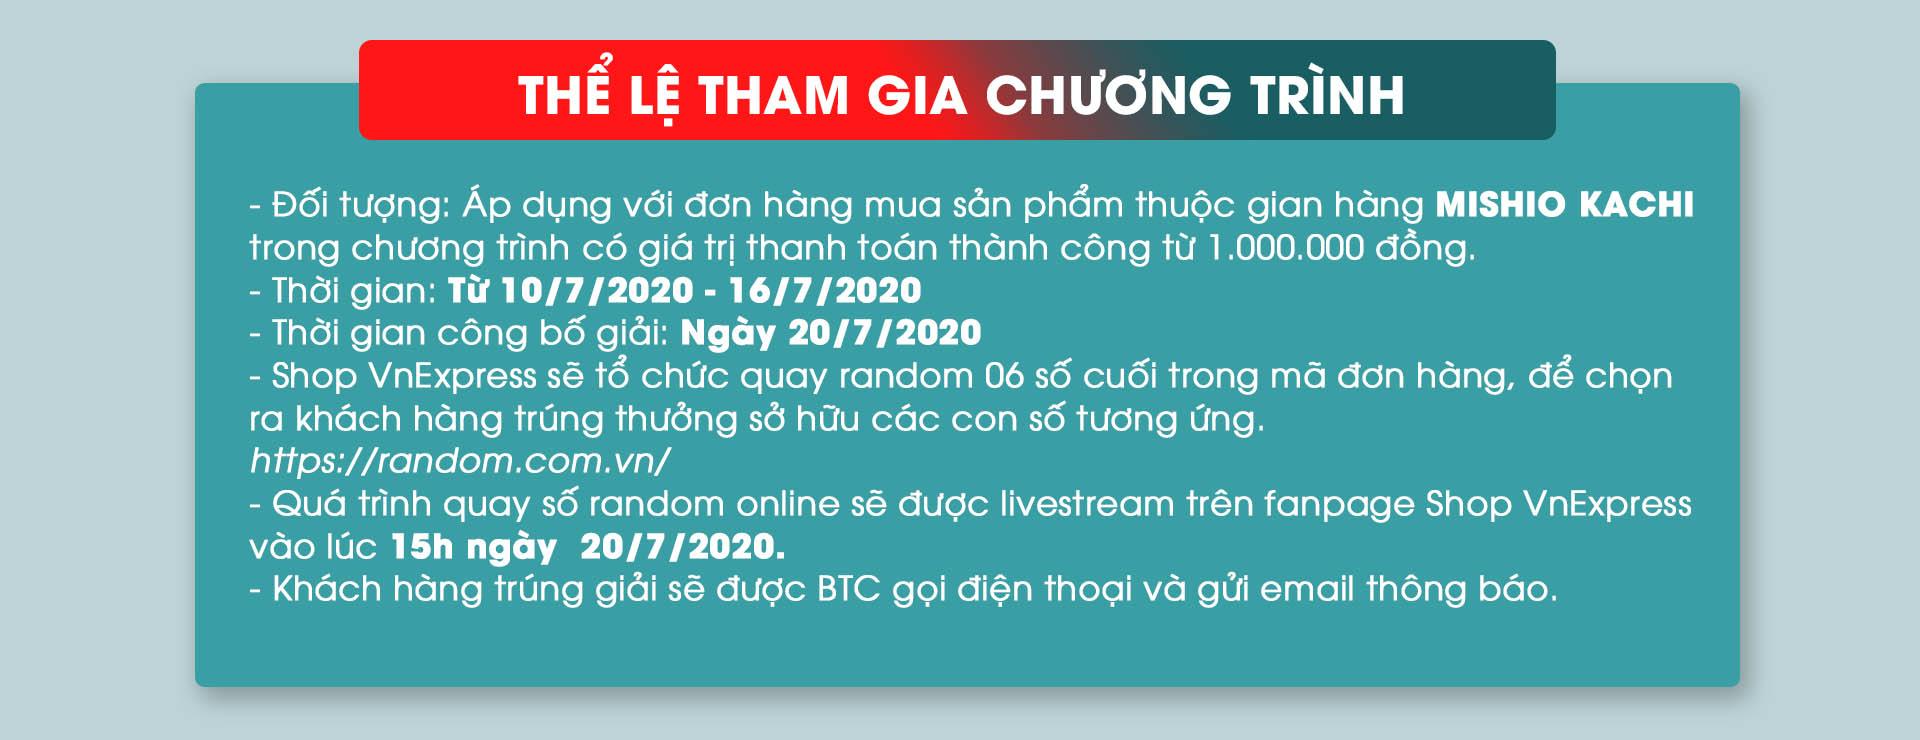 The le chuong trinh